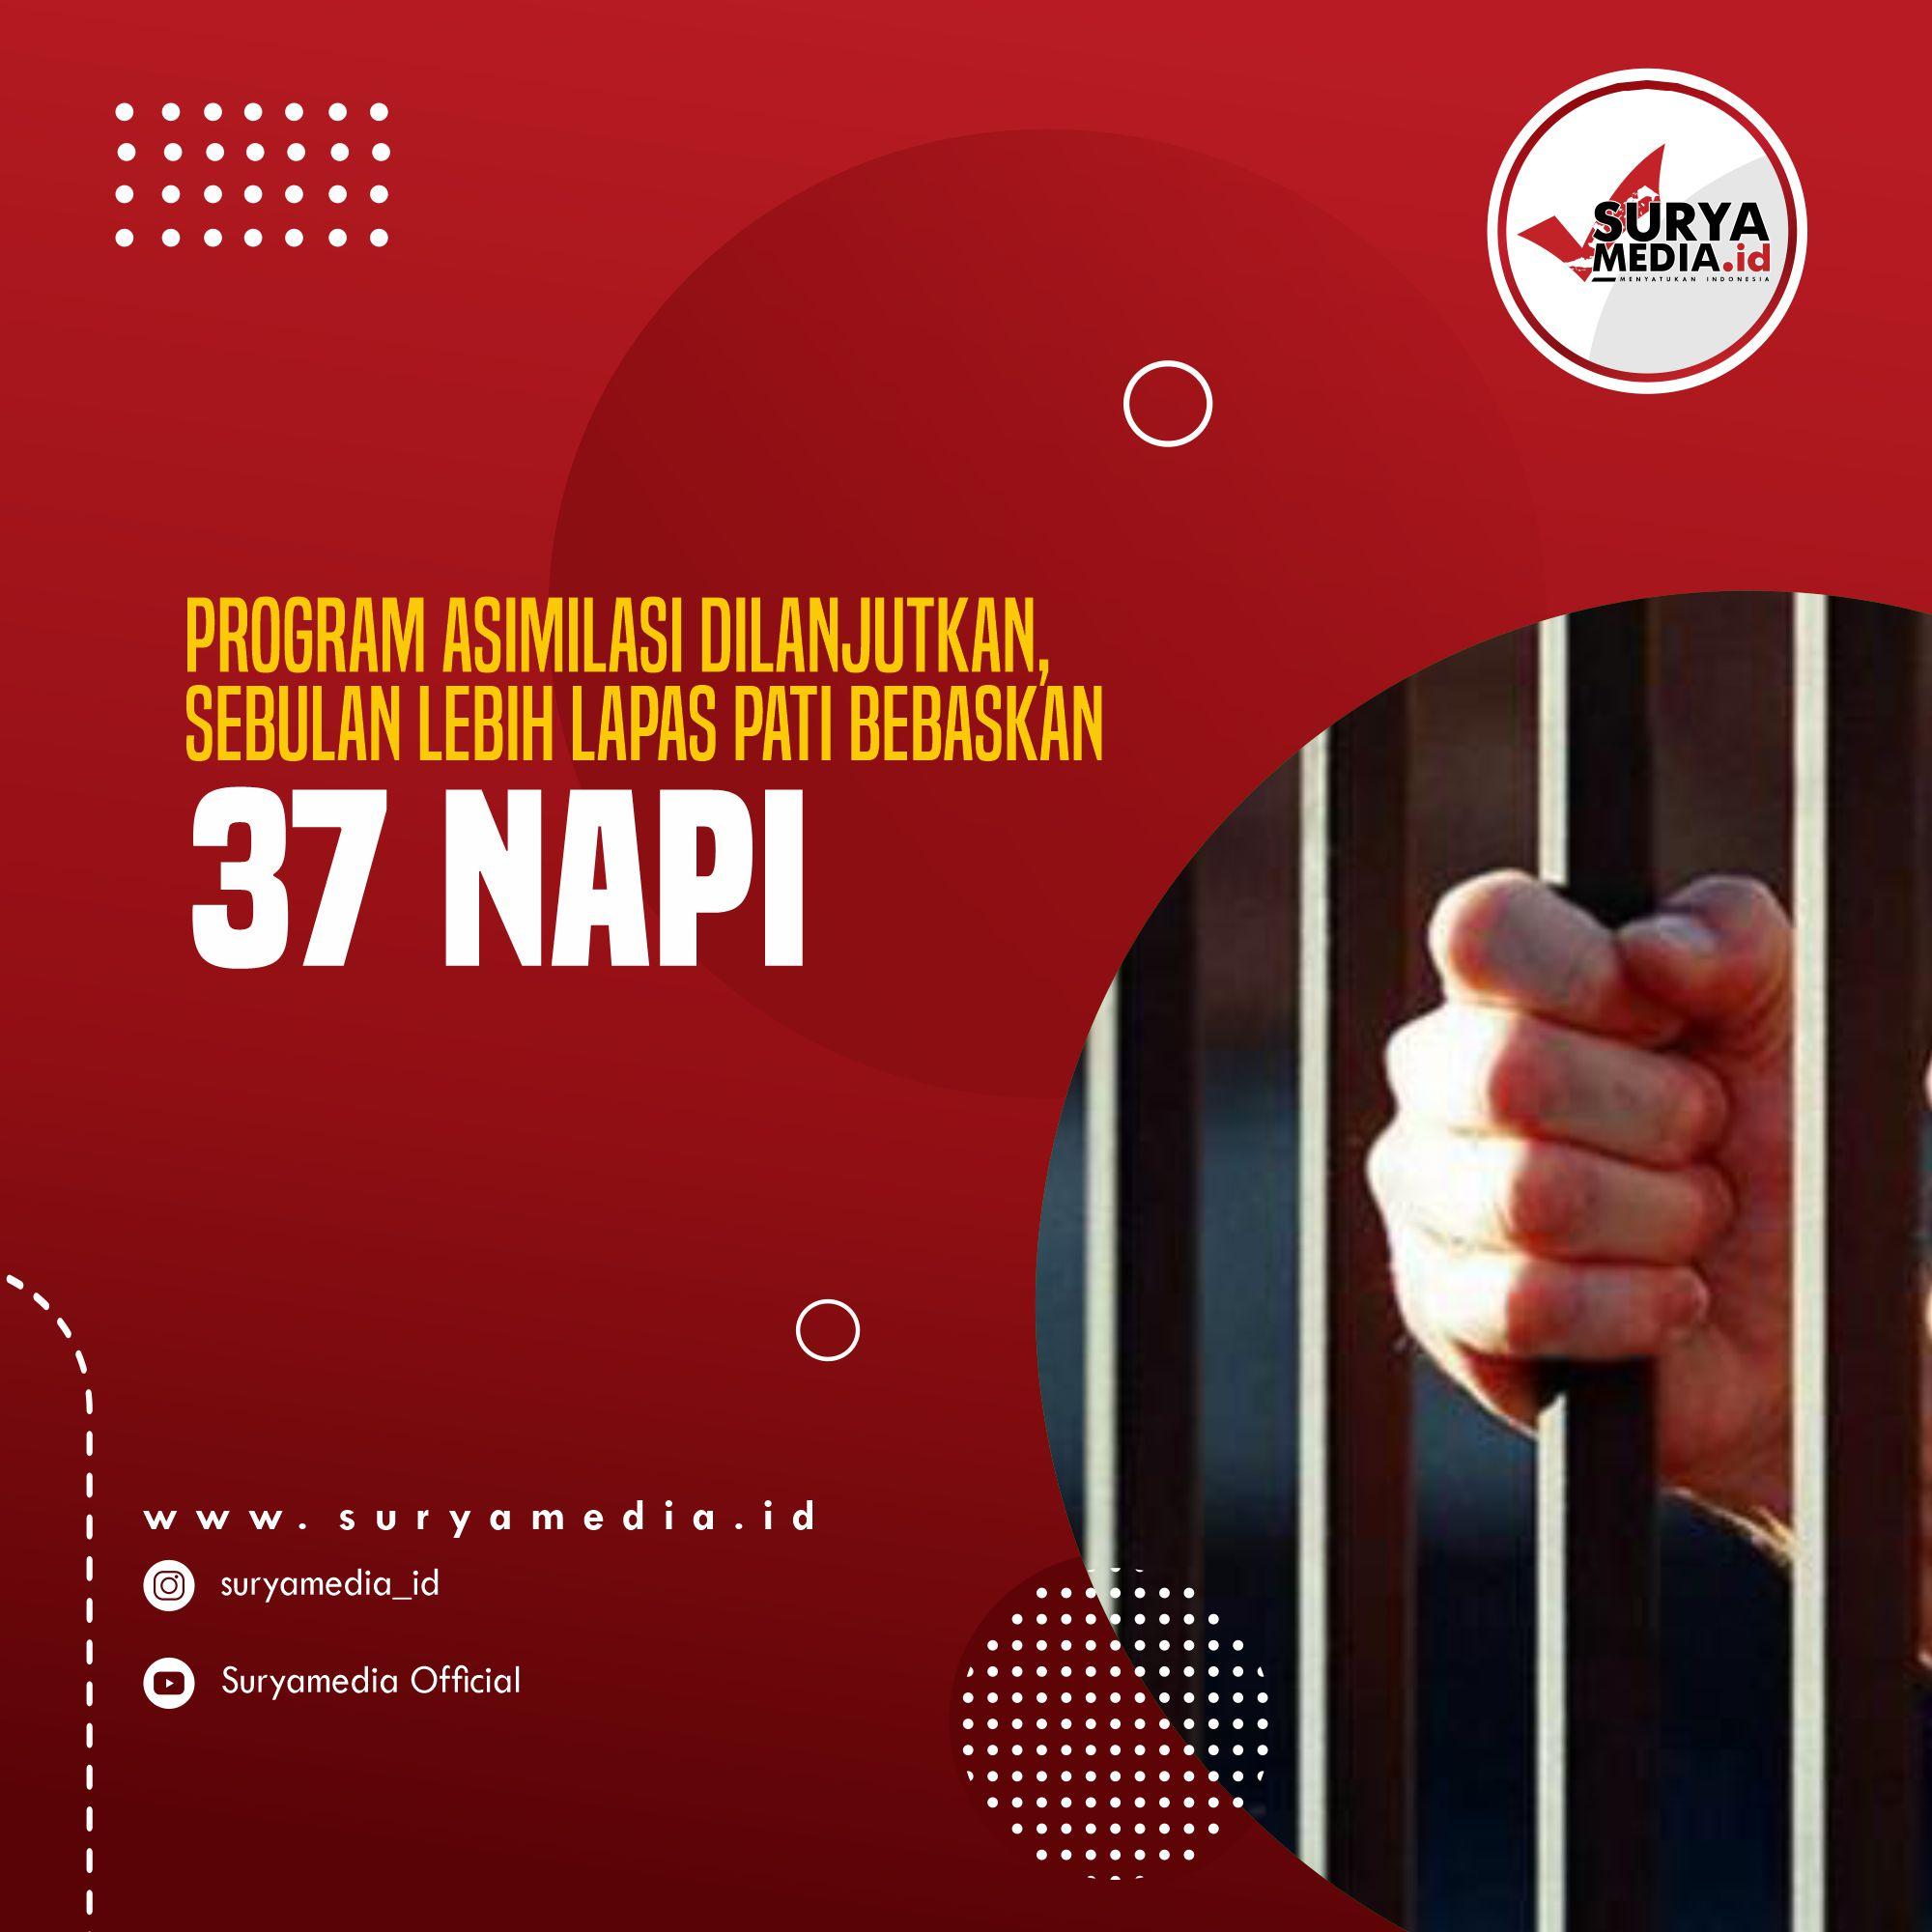 Program Asimilasi Dilanjutkan, Sebulan Lebih Lapas Pati Bebaskan 37 Napi A